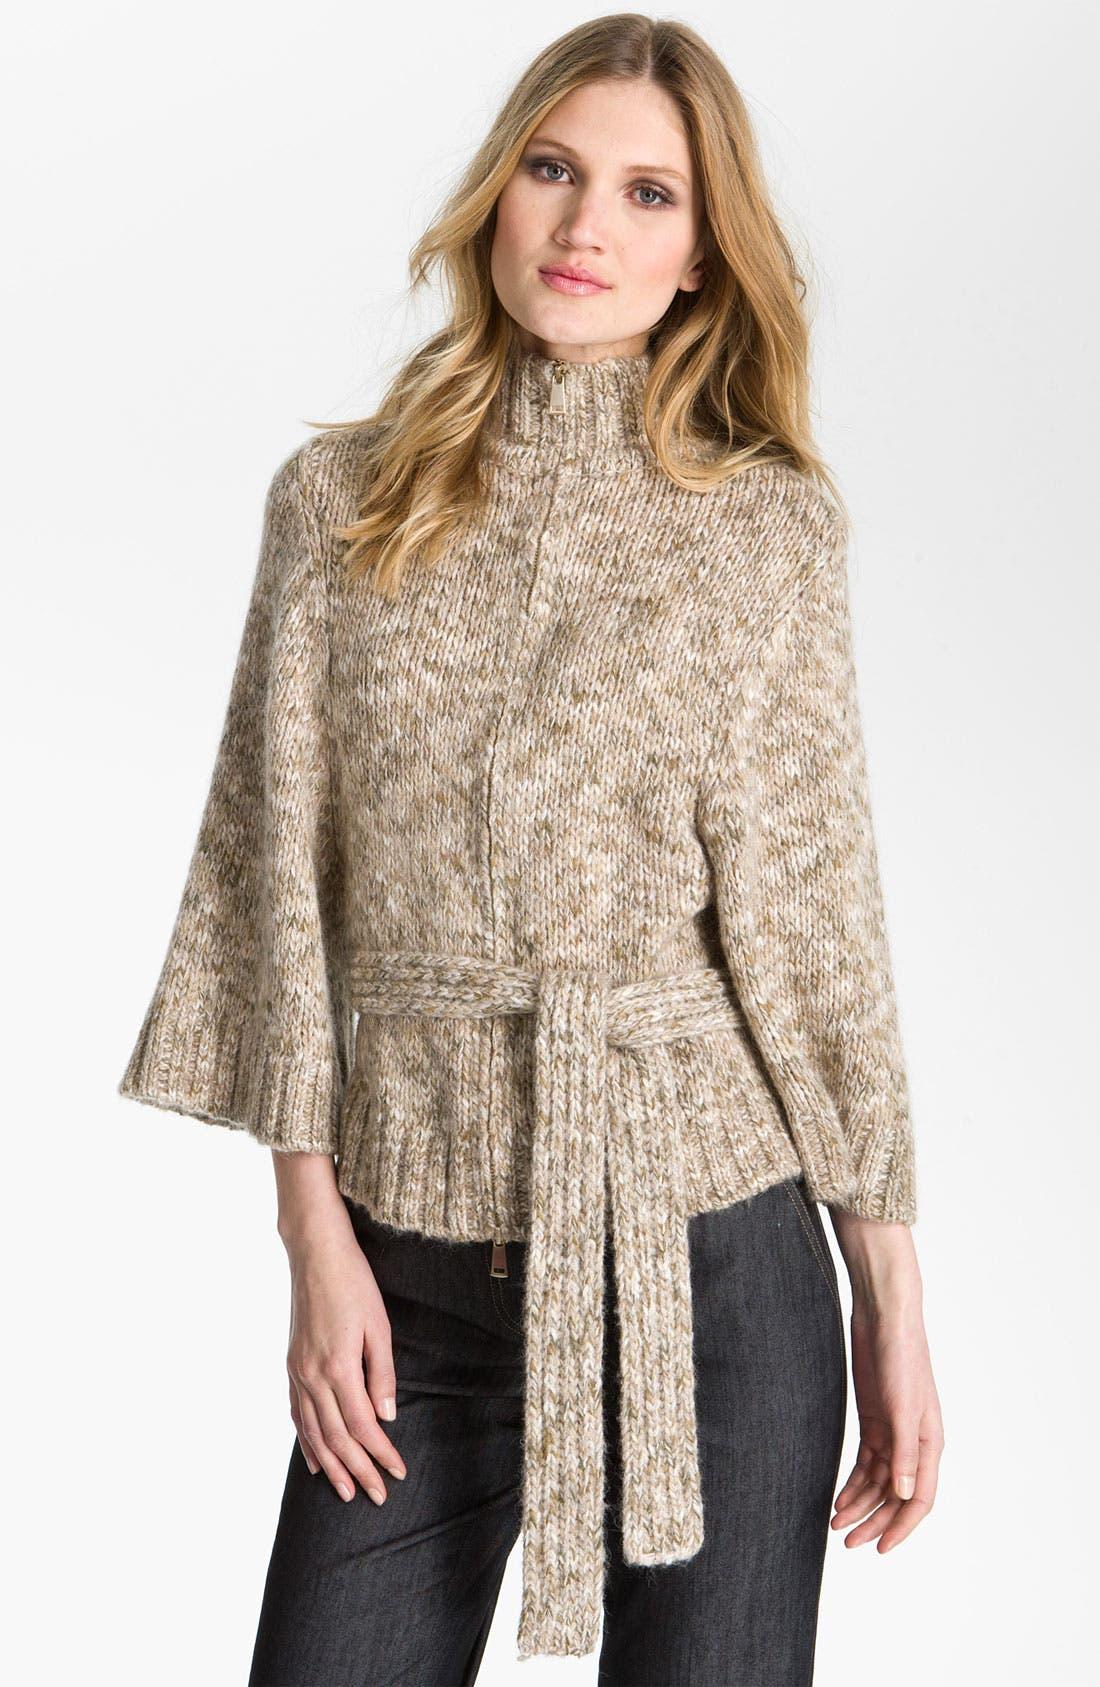 Main Image - St. John Yellow Label Belted Tweed Knit Cardigan